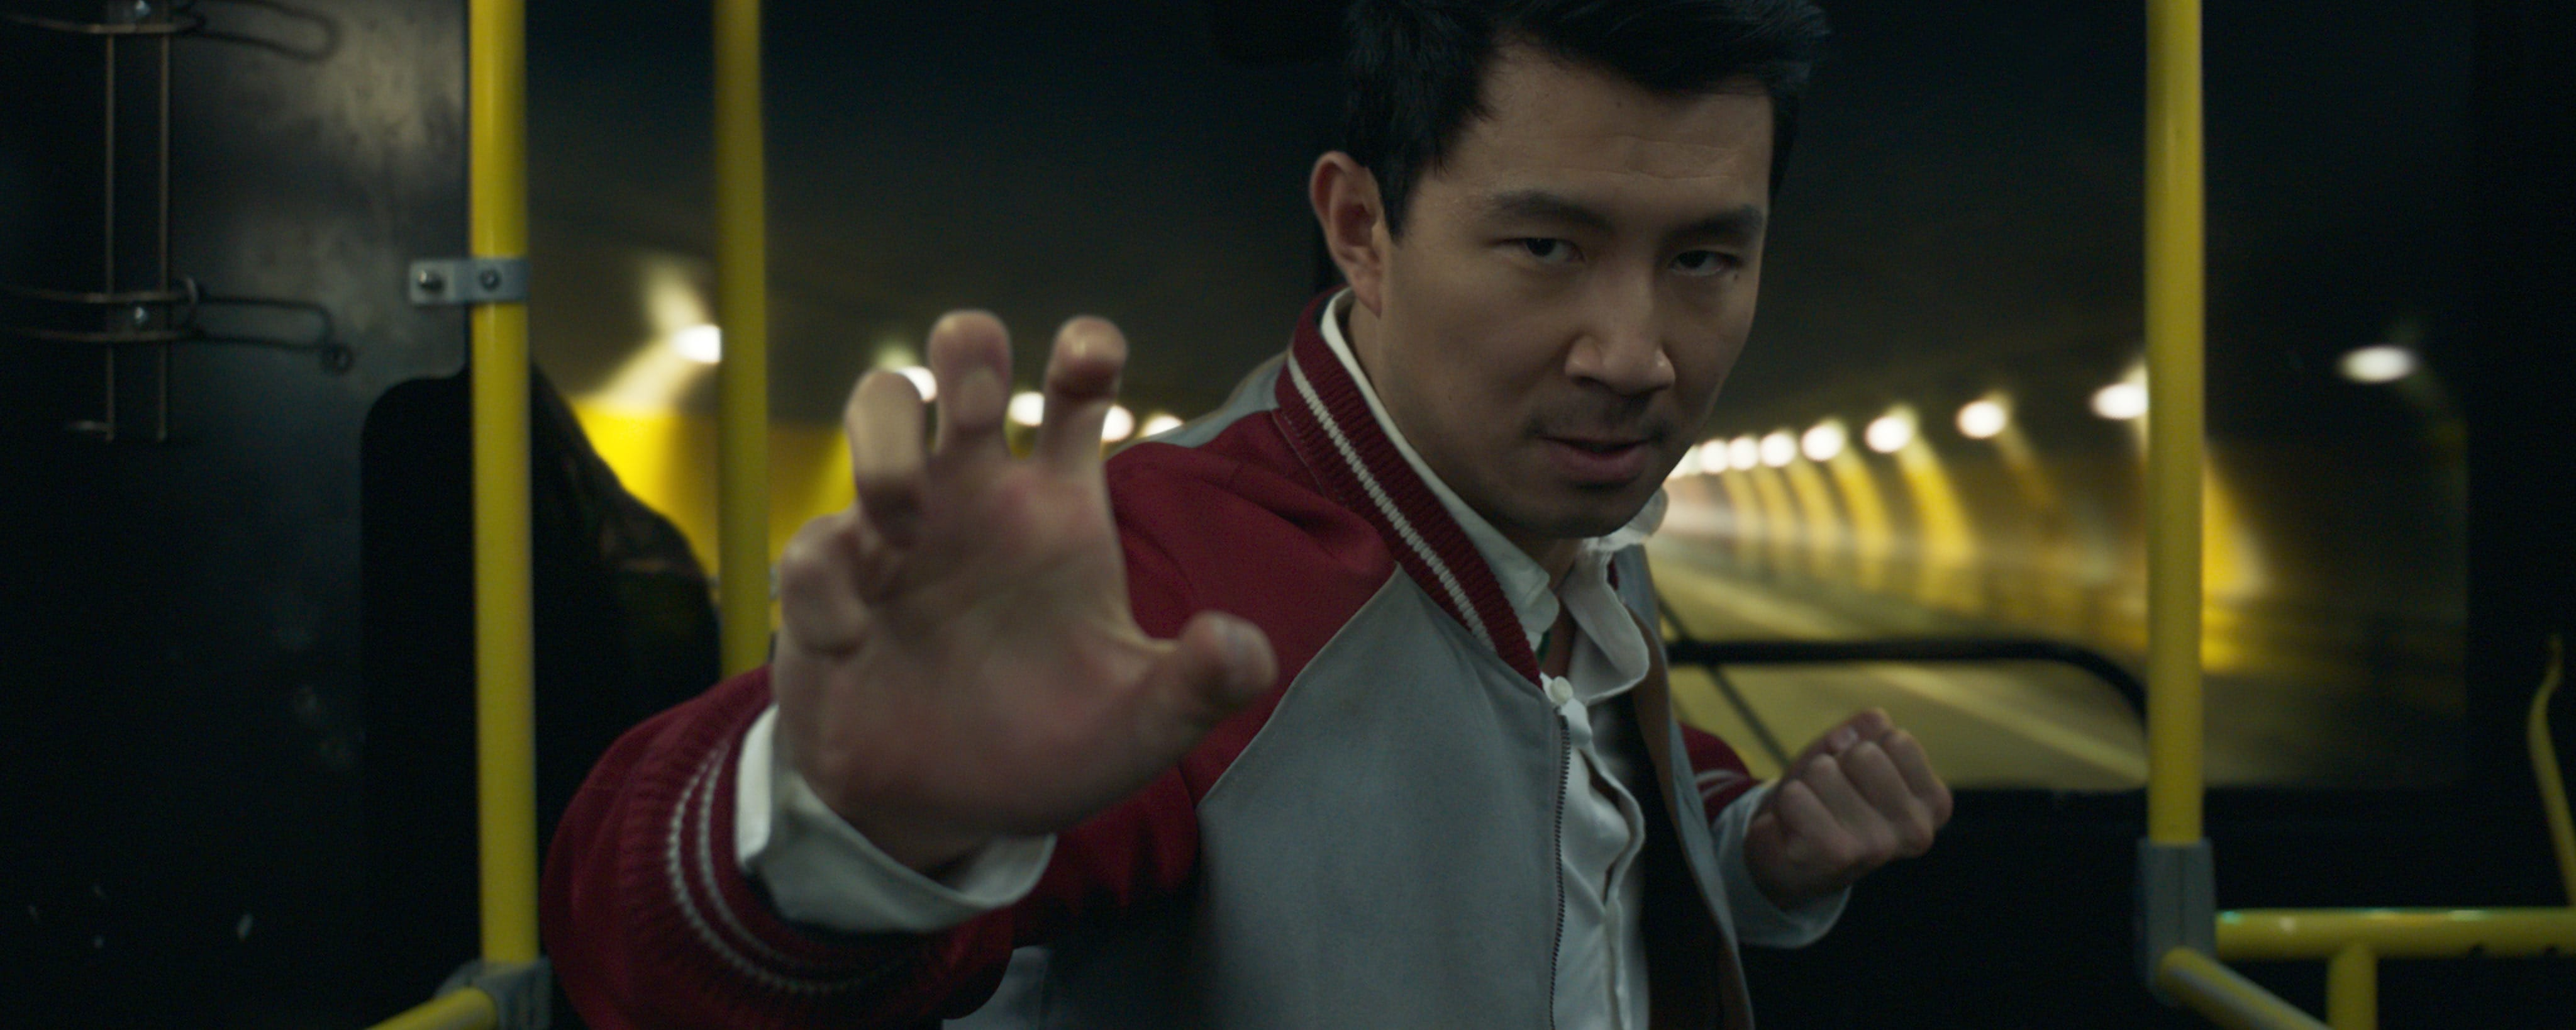 Simu Liu plays Shang-Chi in Marvel Studios' Shang-Chi and The Legend of The Ten Rings